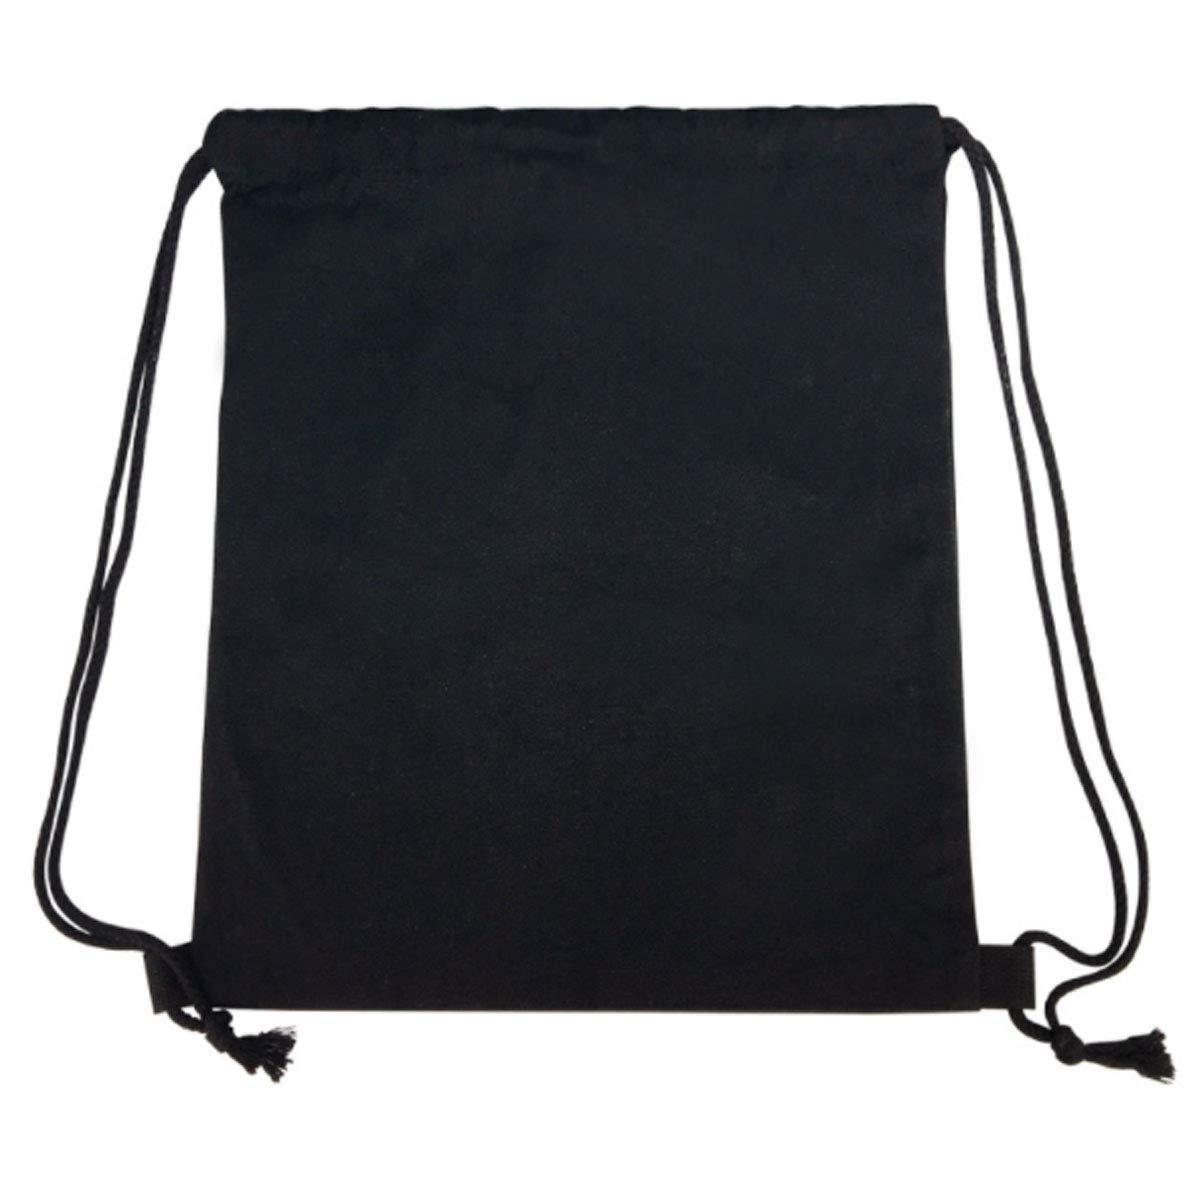 Backpack Drawstring Drawstring Deadpool Printed Canvas Pocket School Book Bag Unisex Satchel Rucksack 6-12 Year Old Black-4034CM